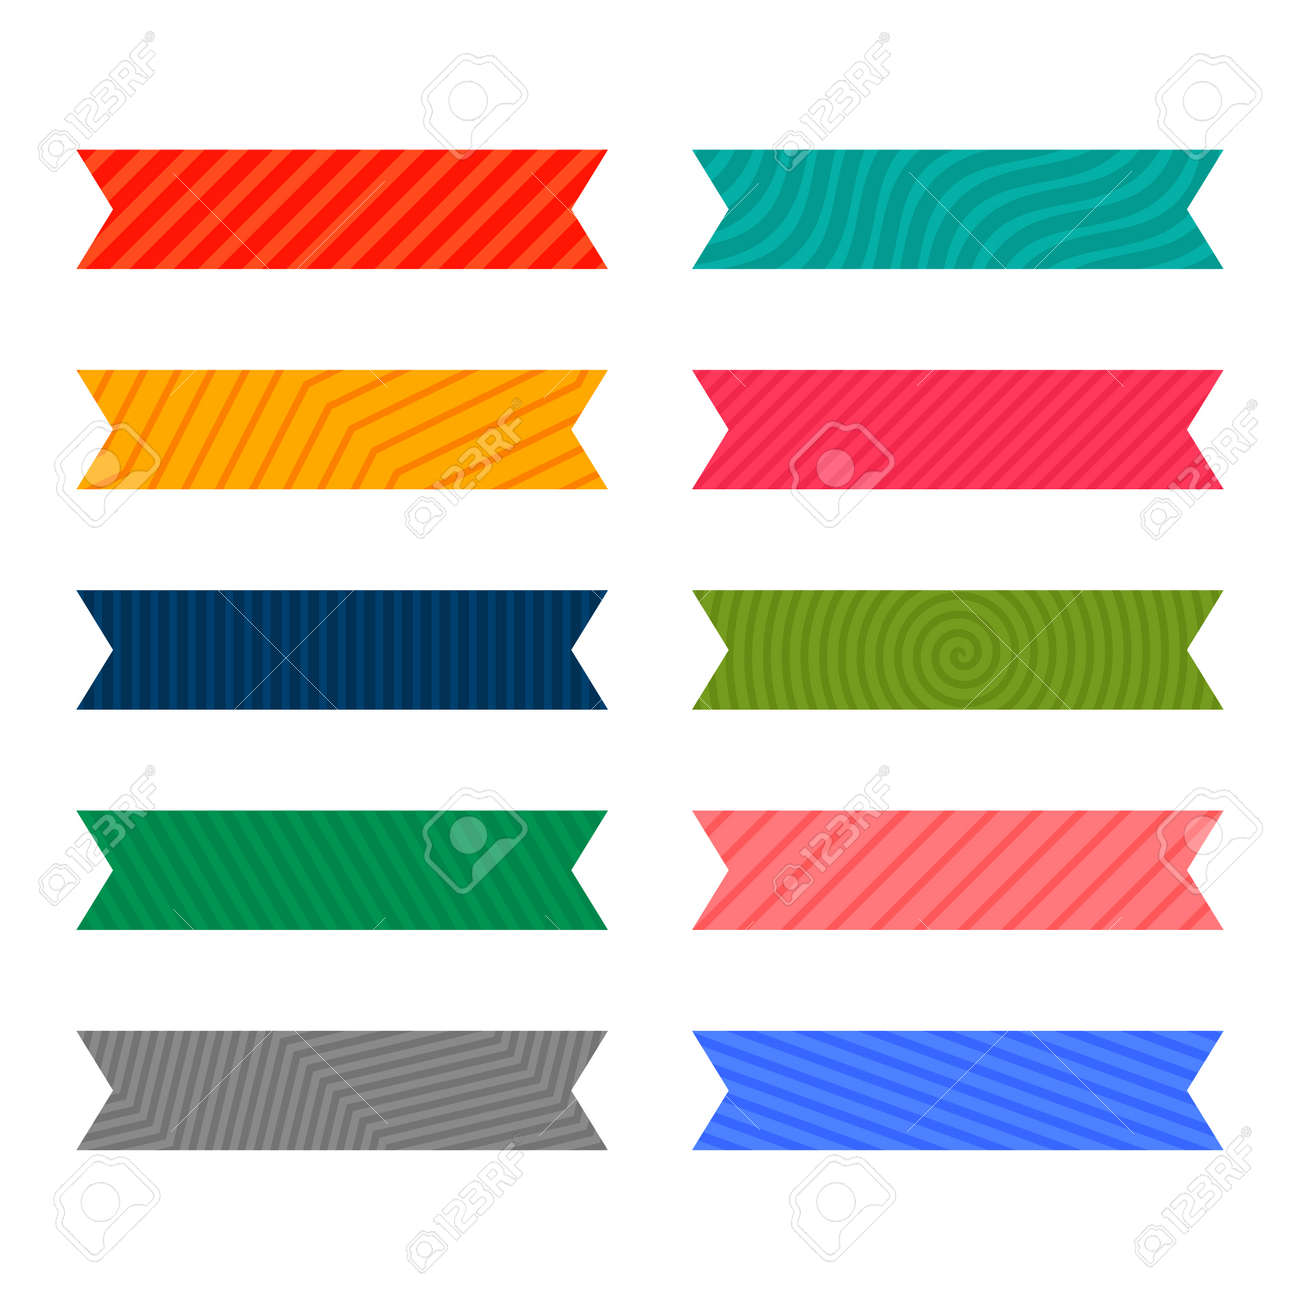 colorful adhesive pattern ribbon or tape set - 167909705